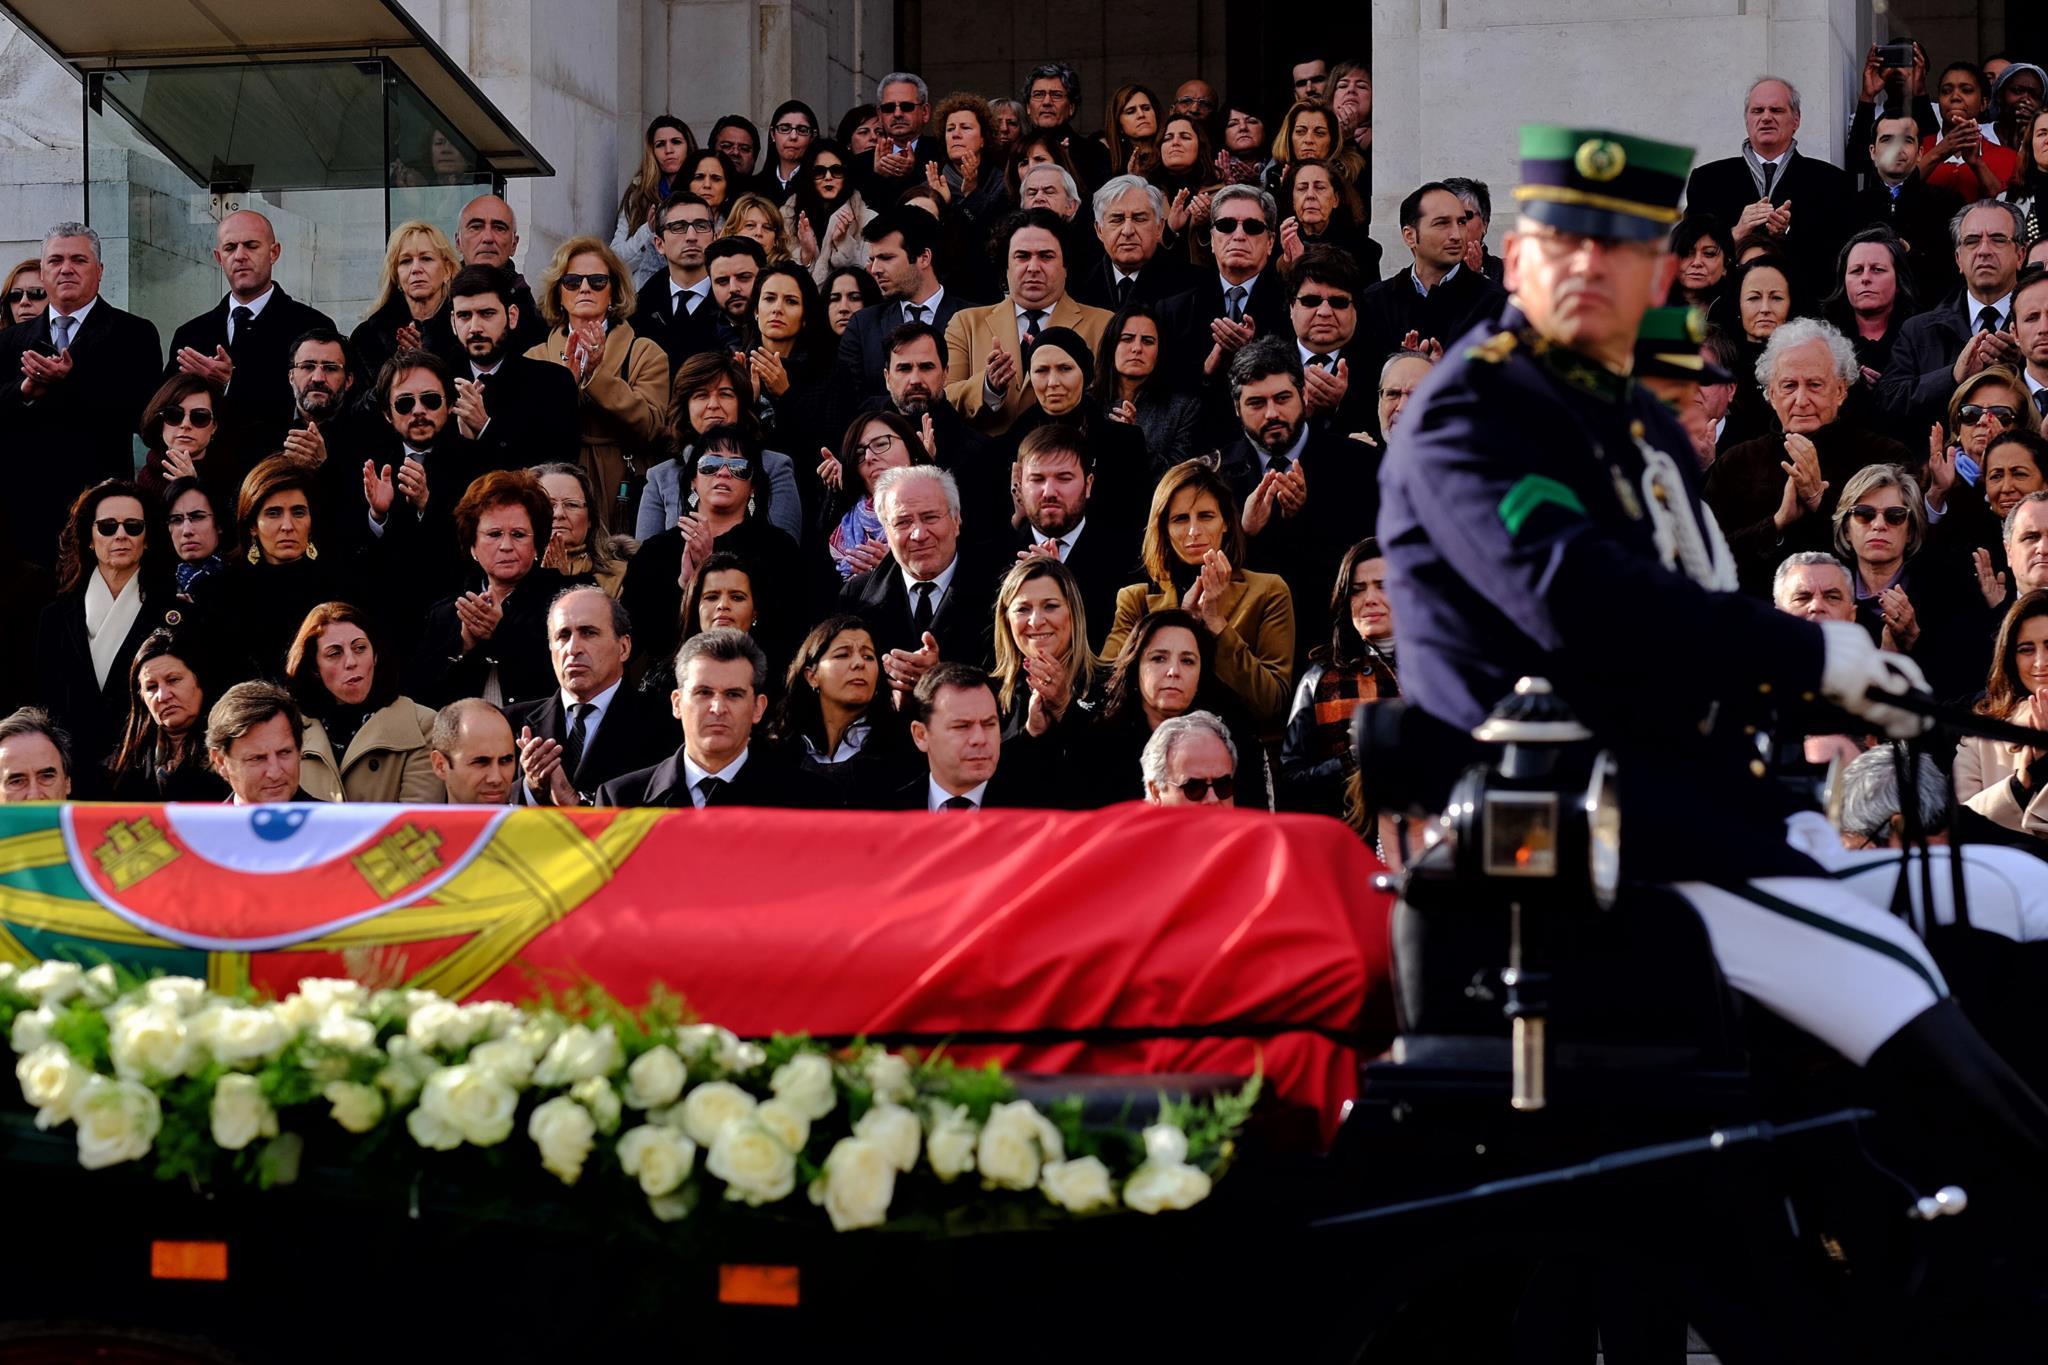 Fotogaleria: A tristeza no adeus a Soares